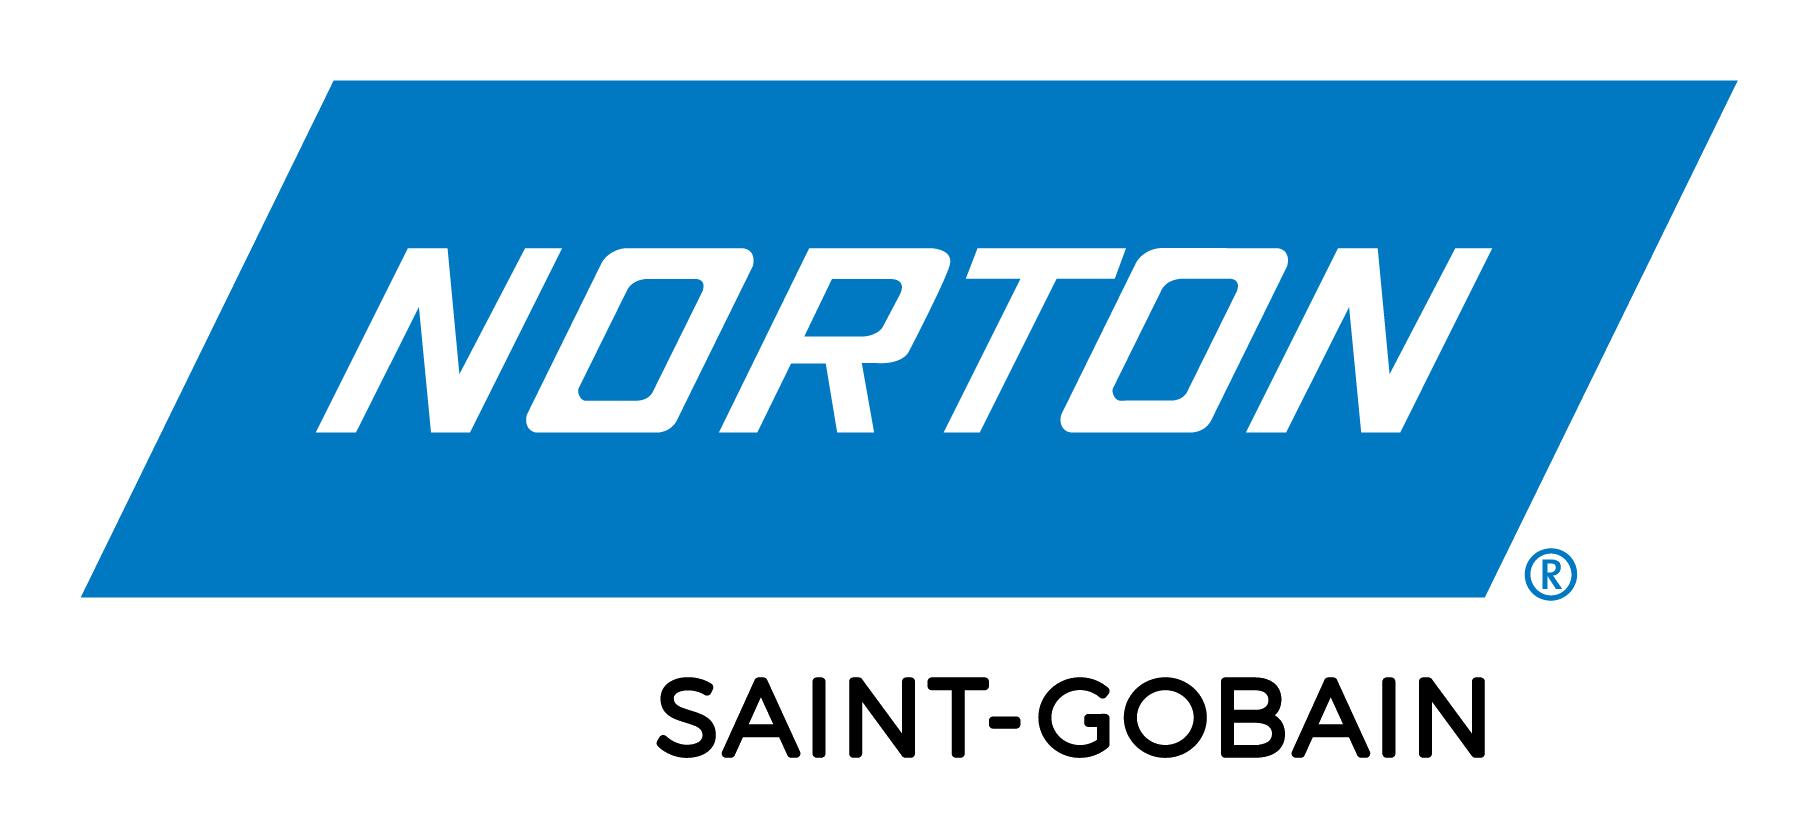 SG_Norton_logo_rgb_7